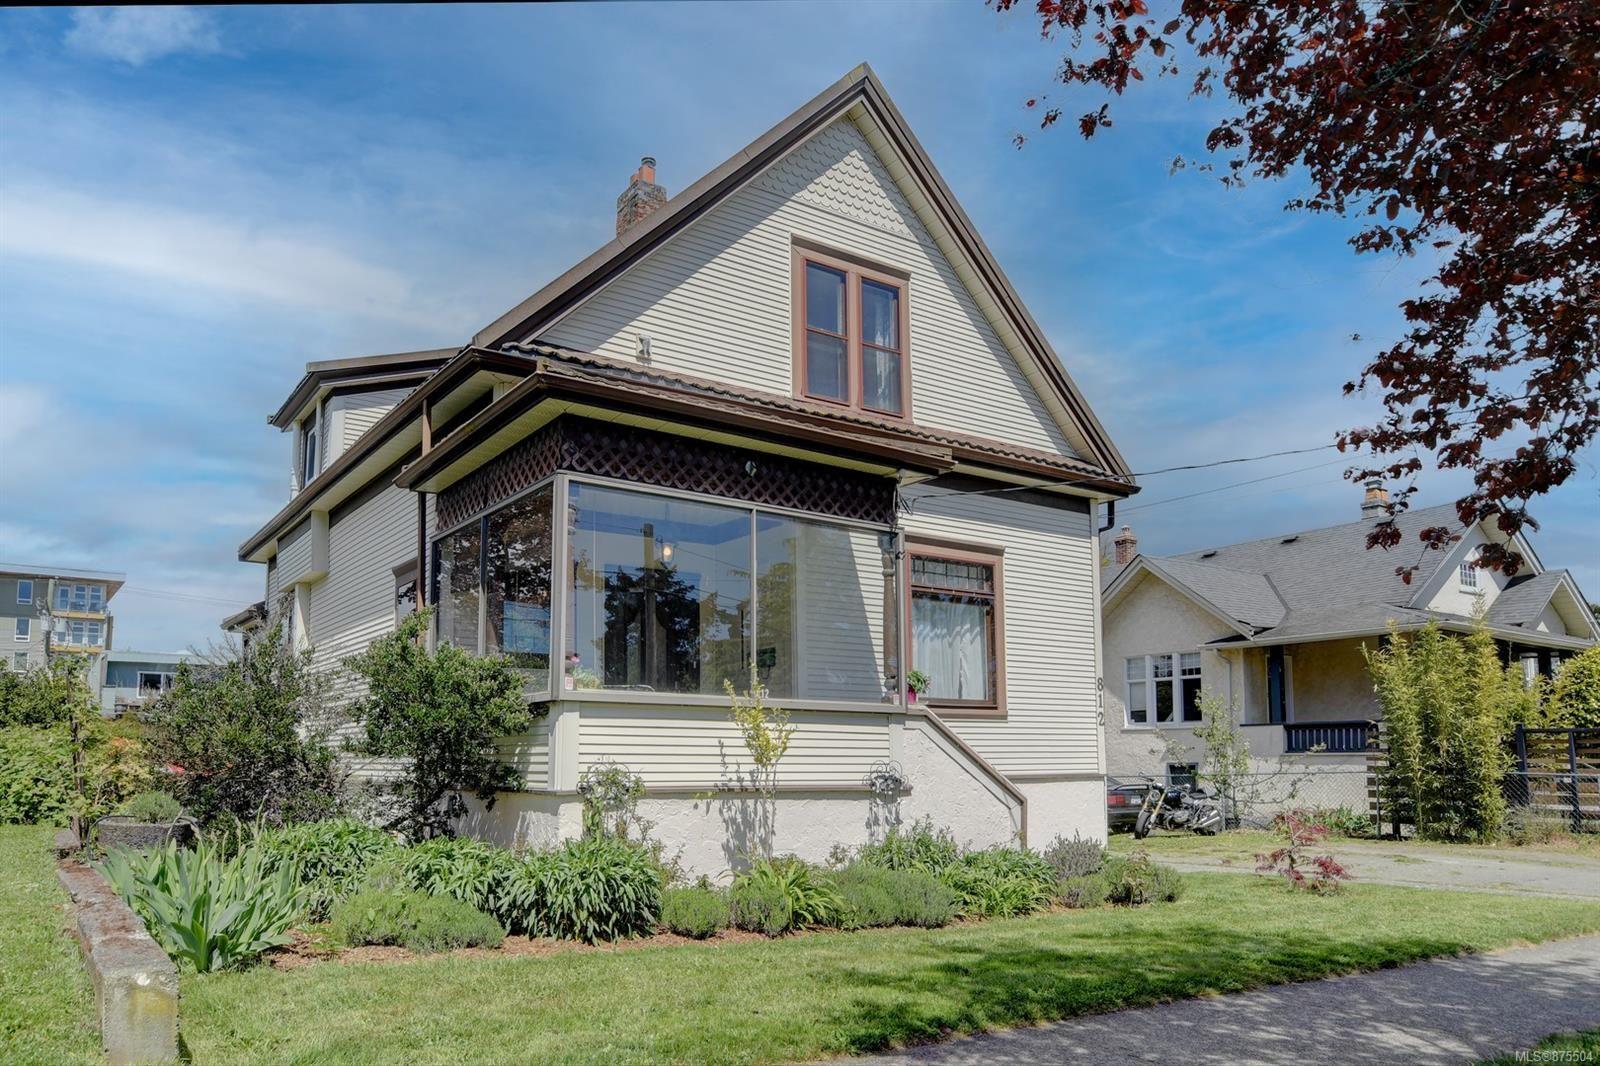 Main Photo: 812 Wollaston St in : Es Old Esquimalt House for sale (Esquimalt)  : MLS®# 875504